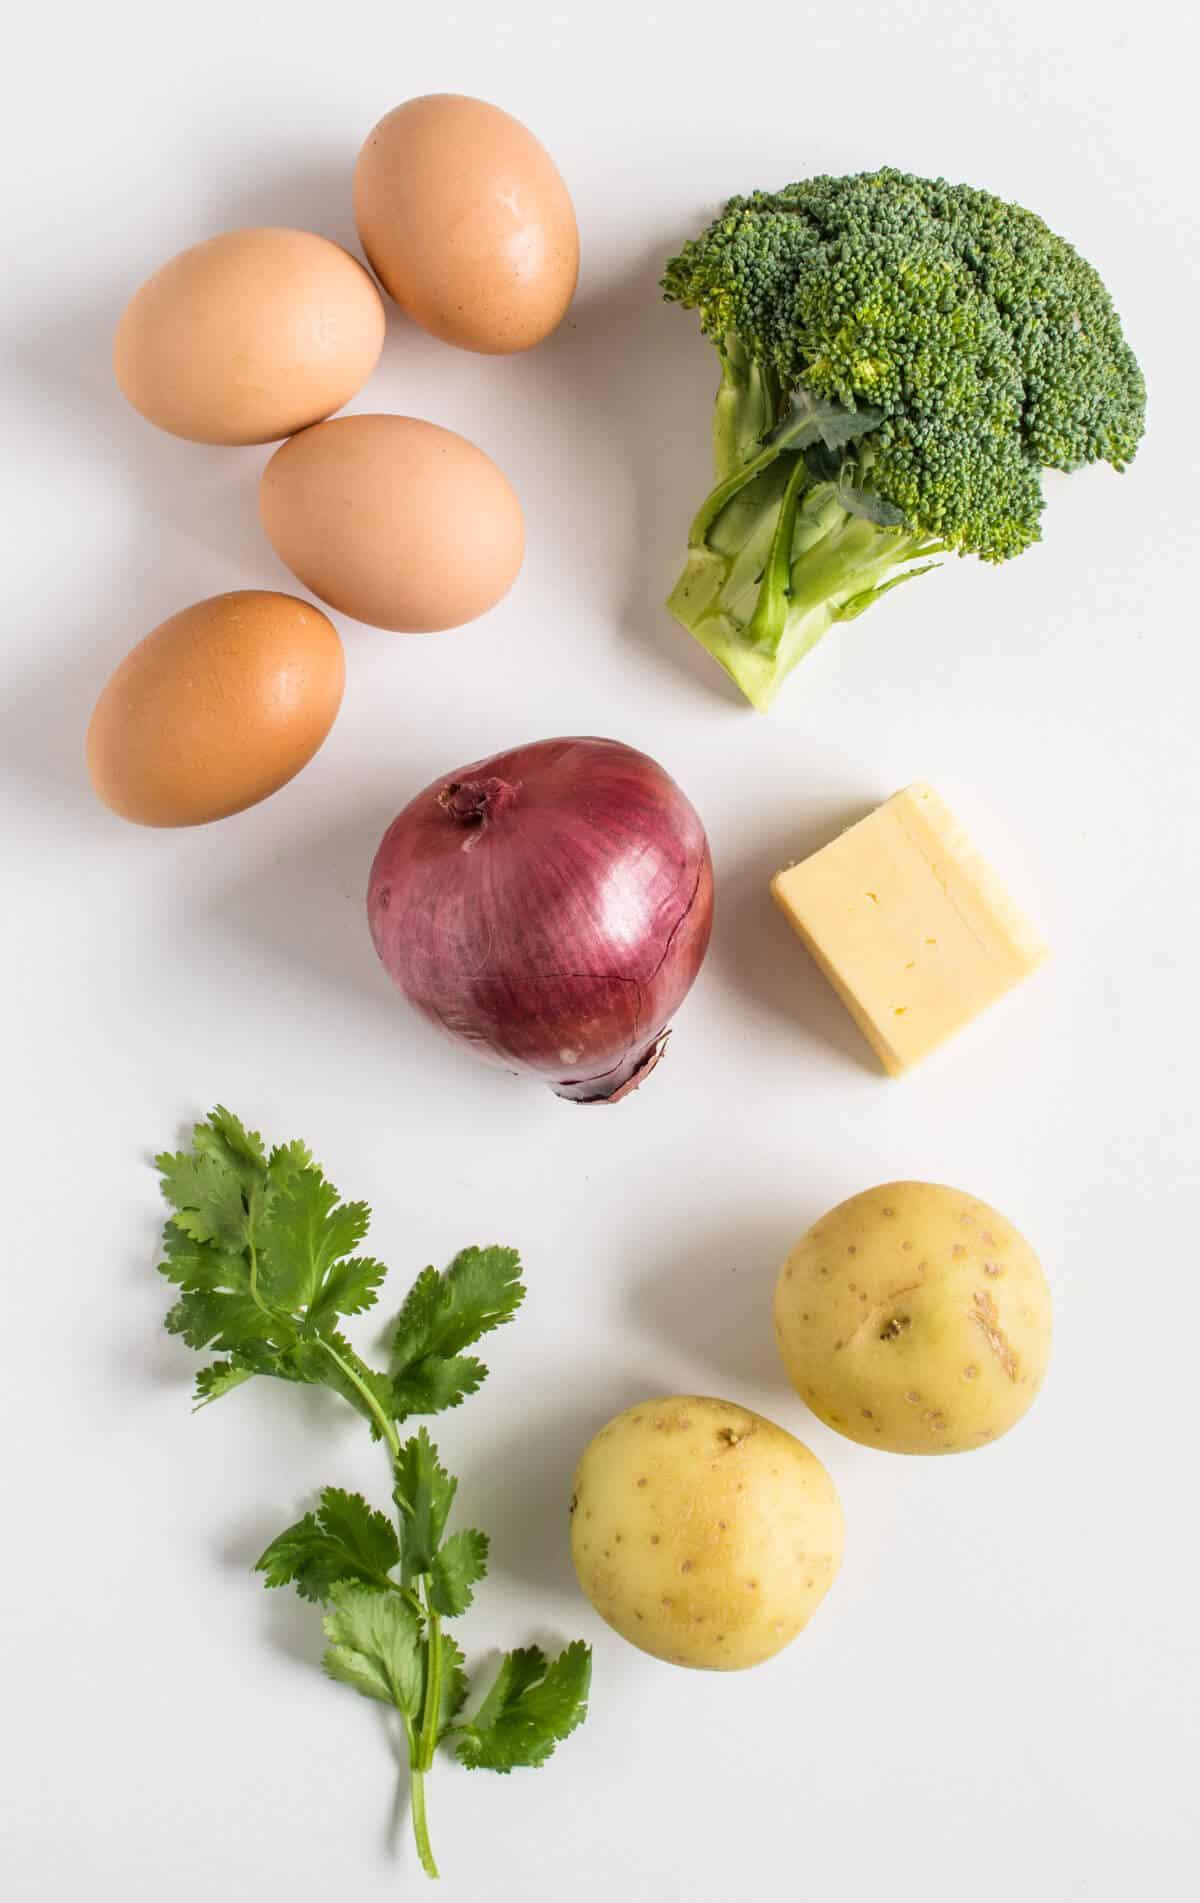 Healthy Eggs Muffins ingredients